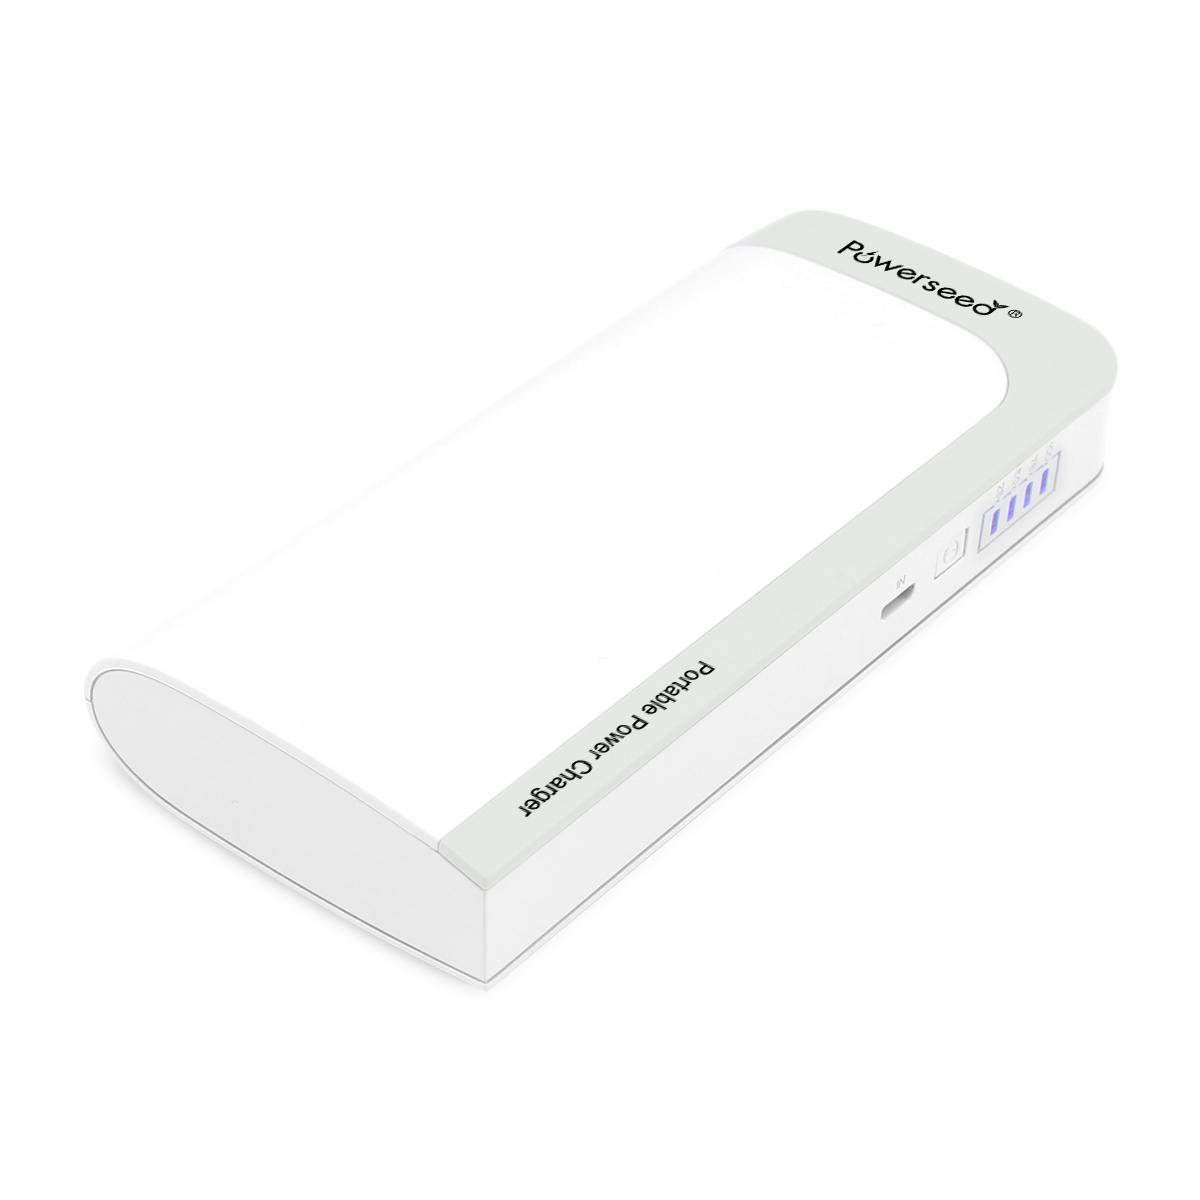 Weiß-grau Powerseed PS-13000b